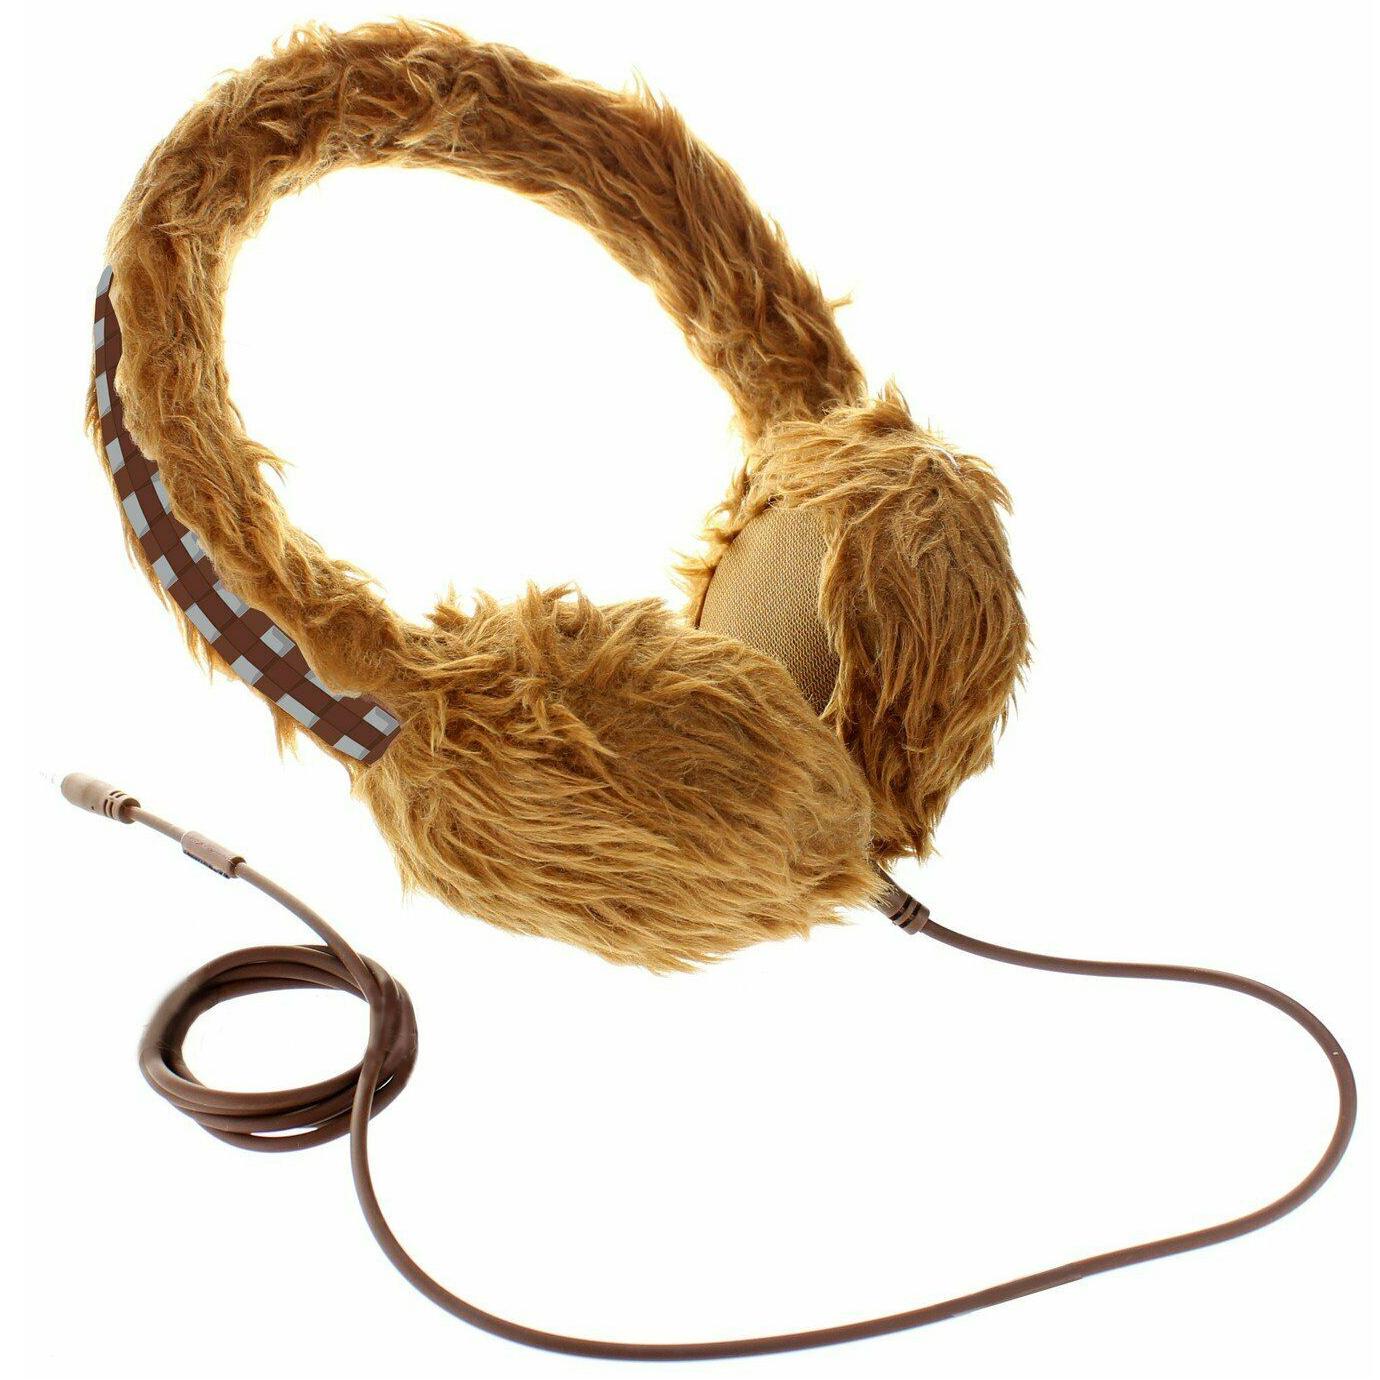 Star Wars Wookie 1m Wired PVC Detachable Cord Adjustable Headphones - Brown Argos on eBay - £6.99